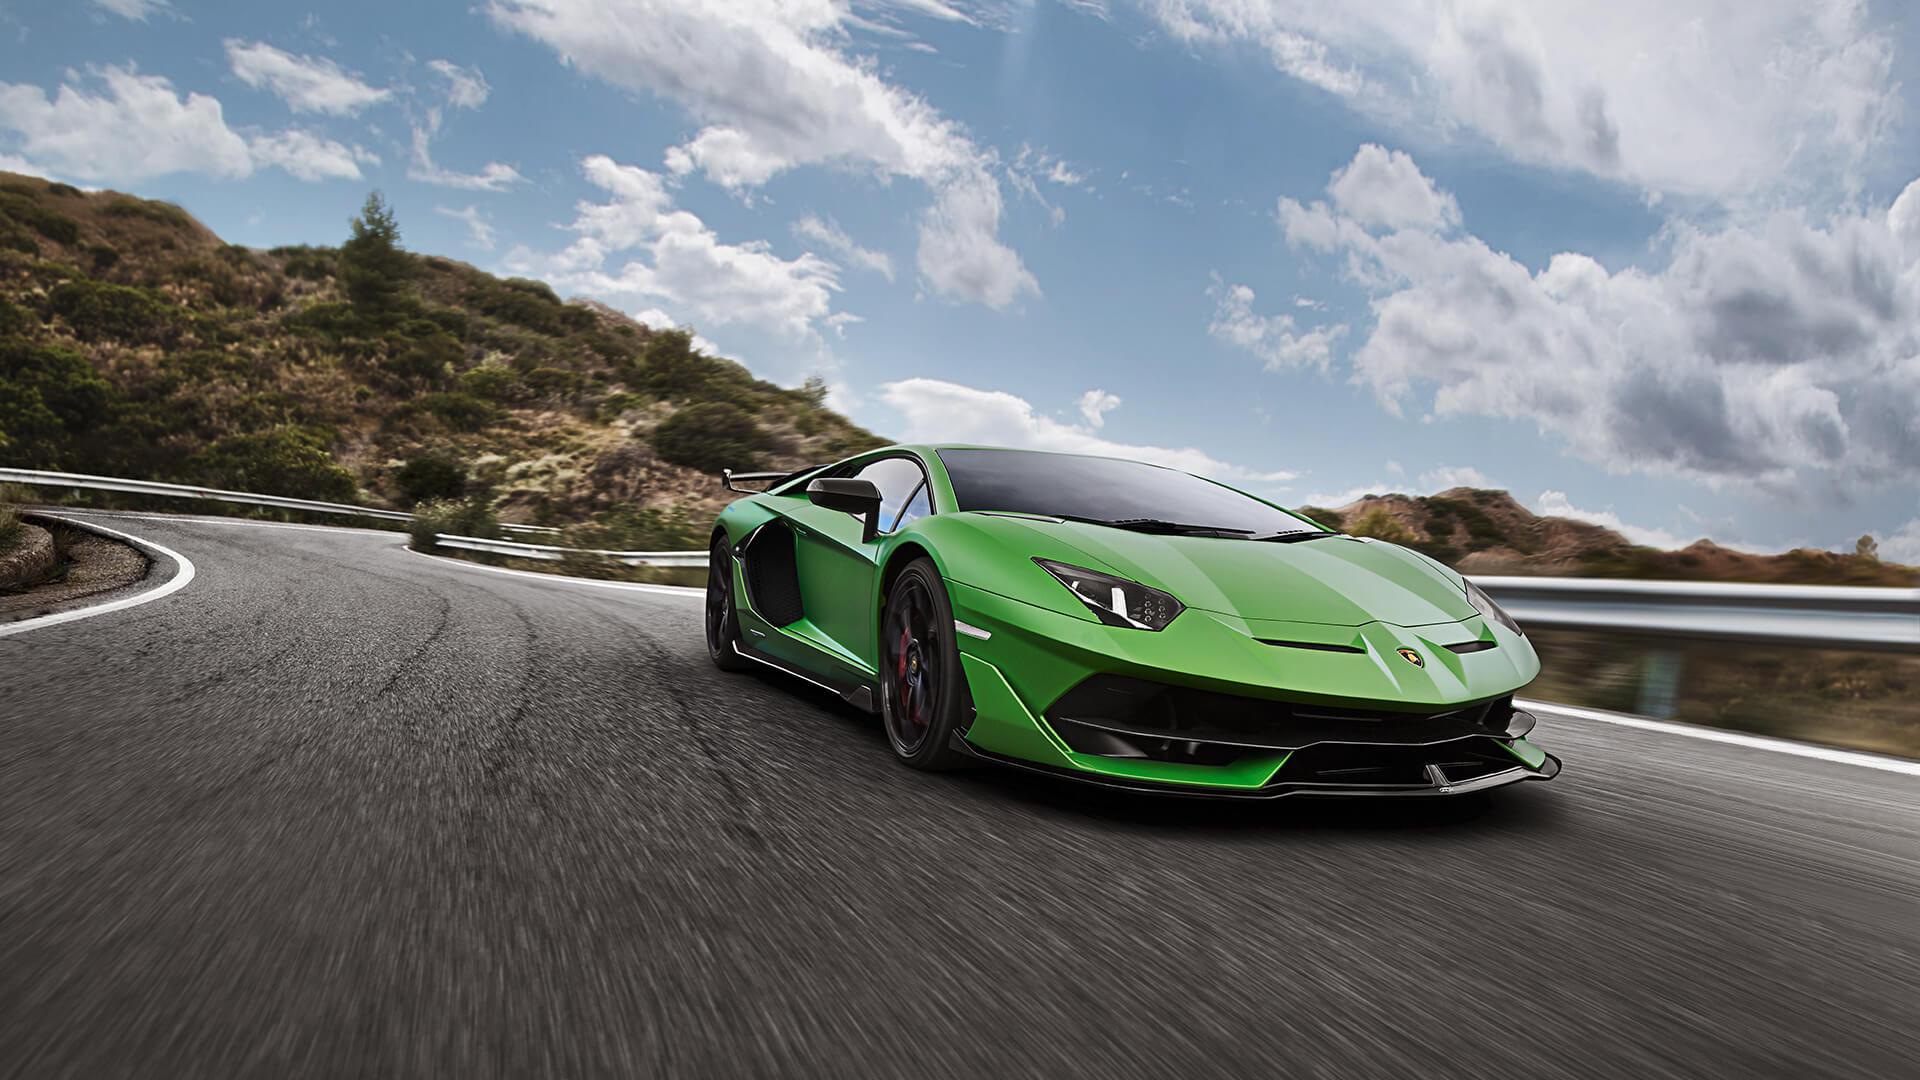 Lamborghini Aventador SVJ Coupé